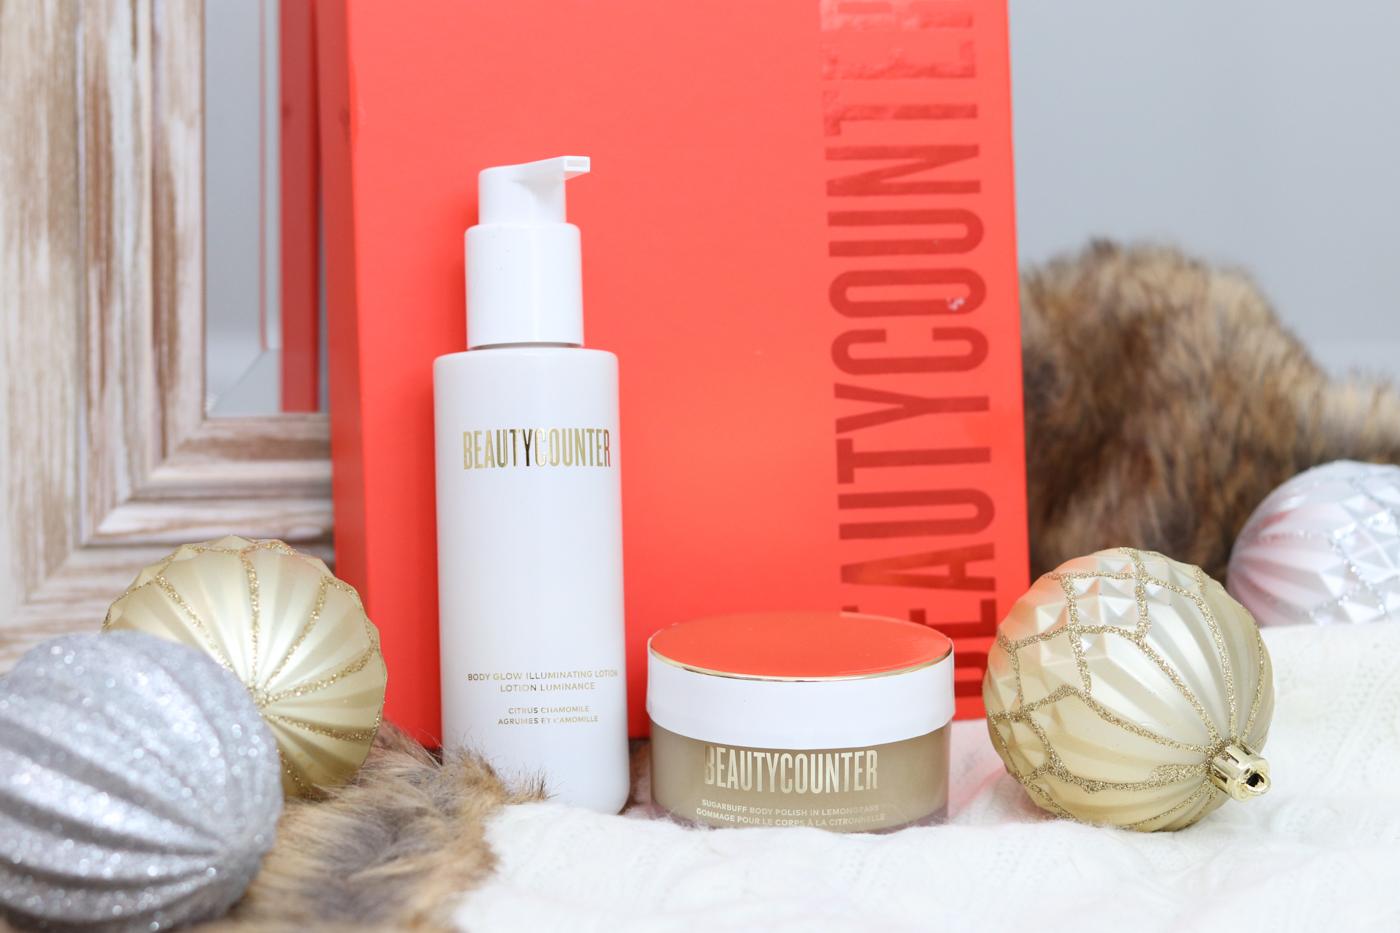 Beautycounter Good Glow Body Duo | Nontoxic sparkly body lotion and sugar body scrub